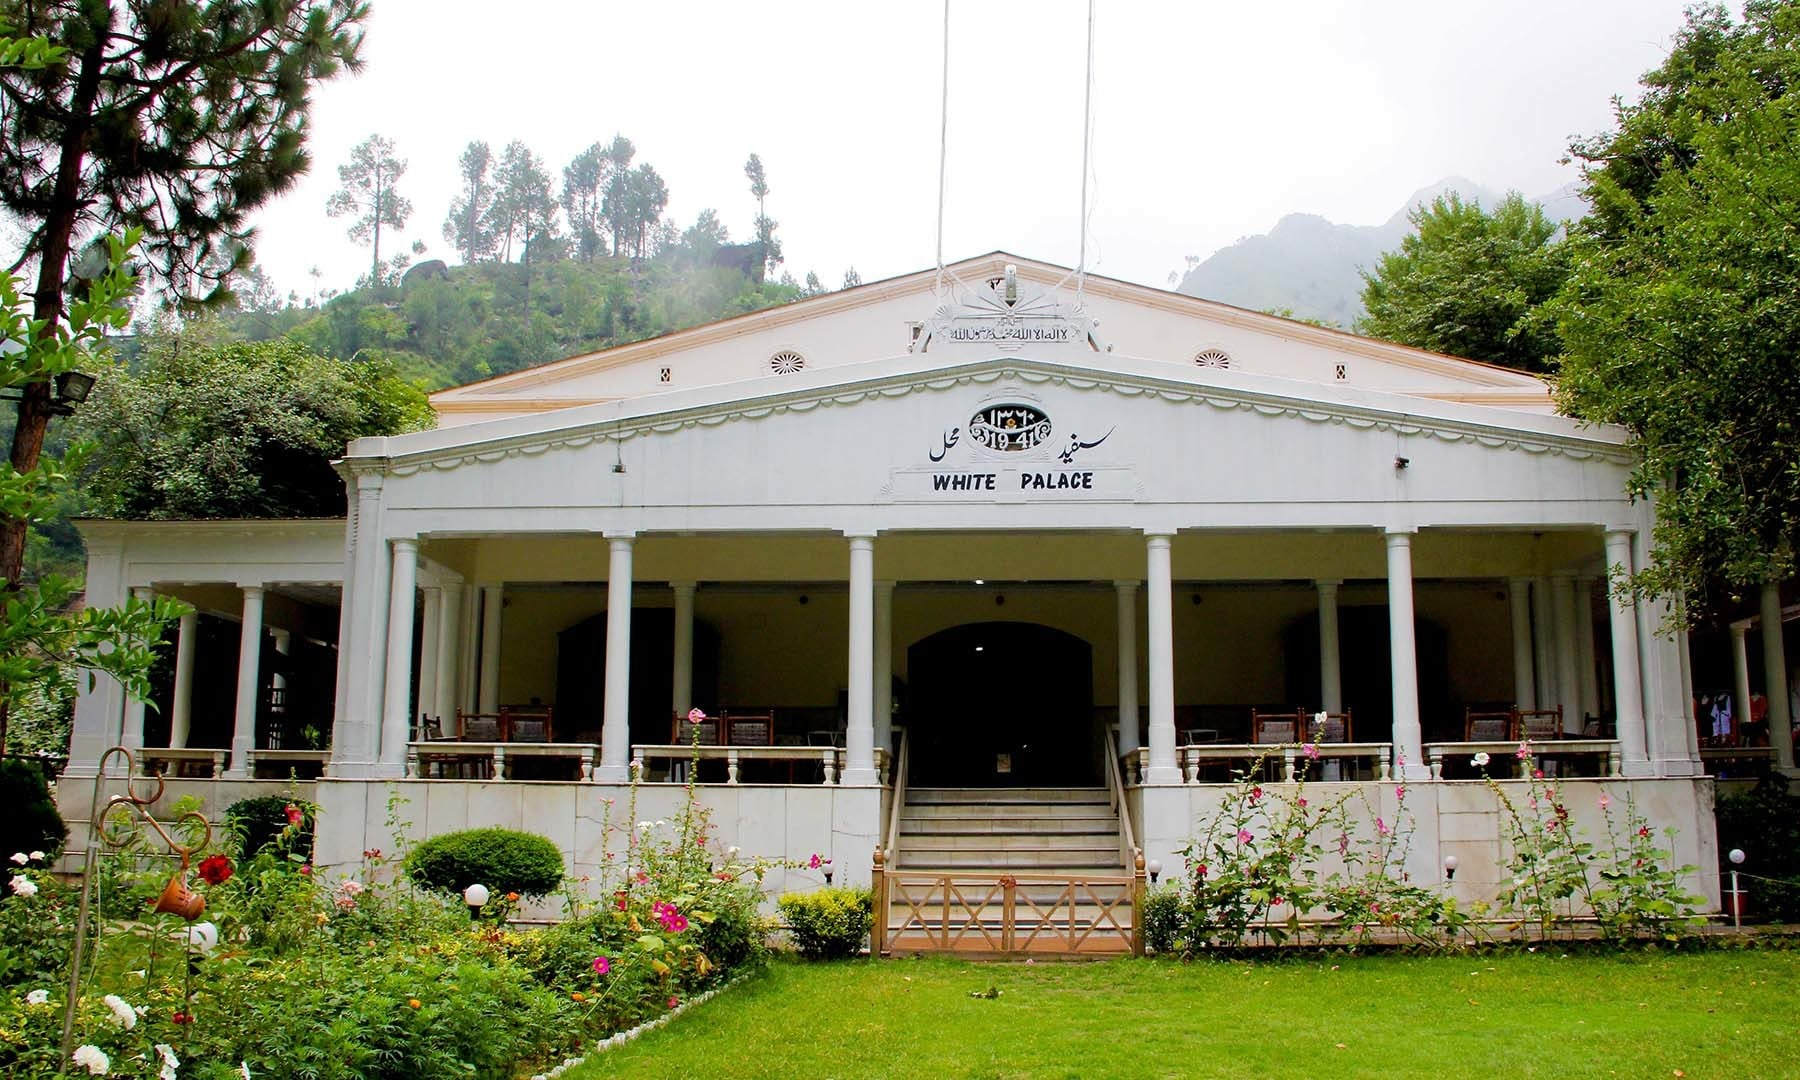 White Palace of SWAT